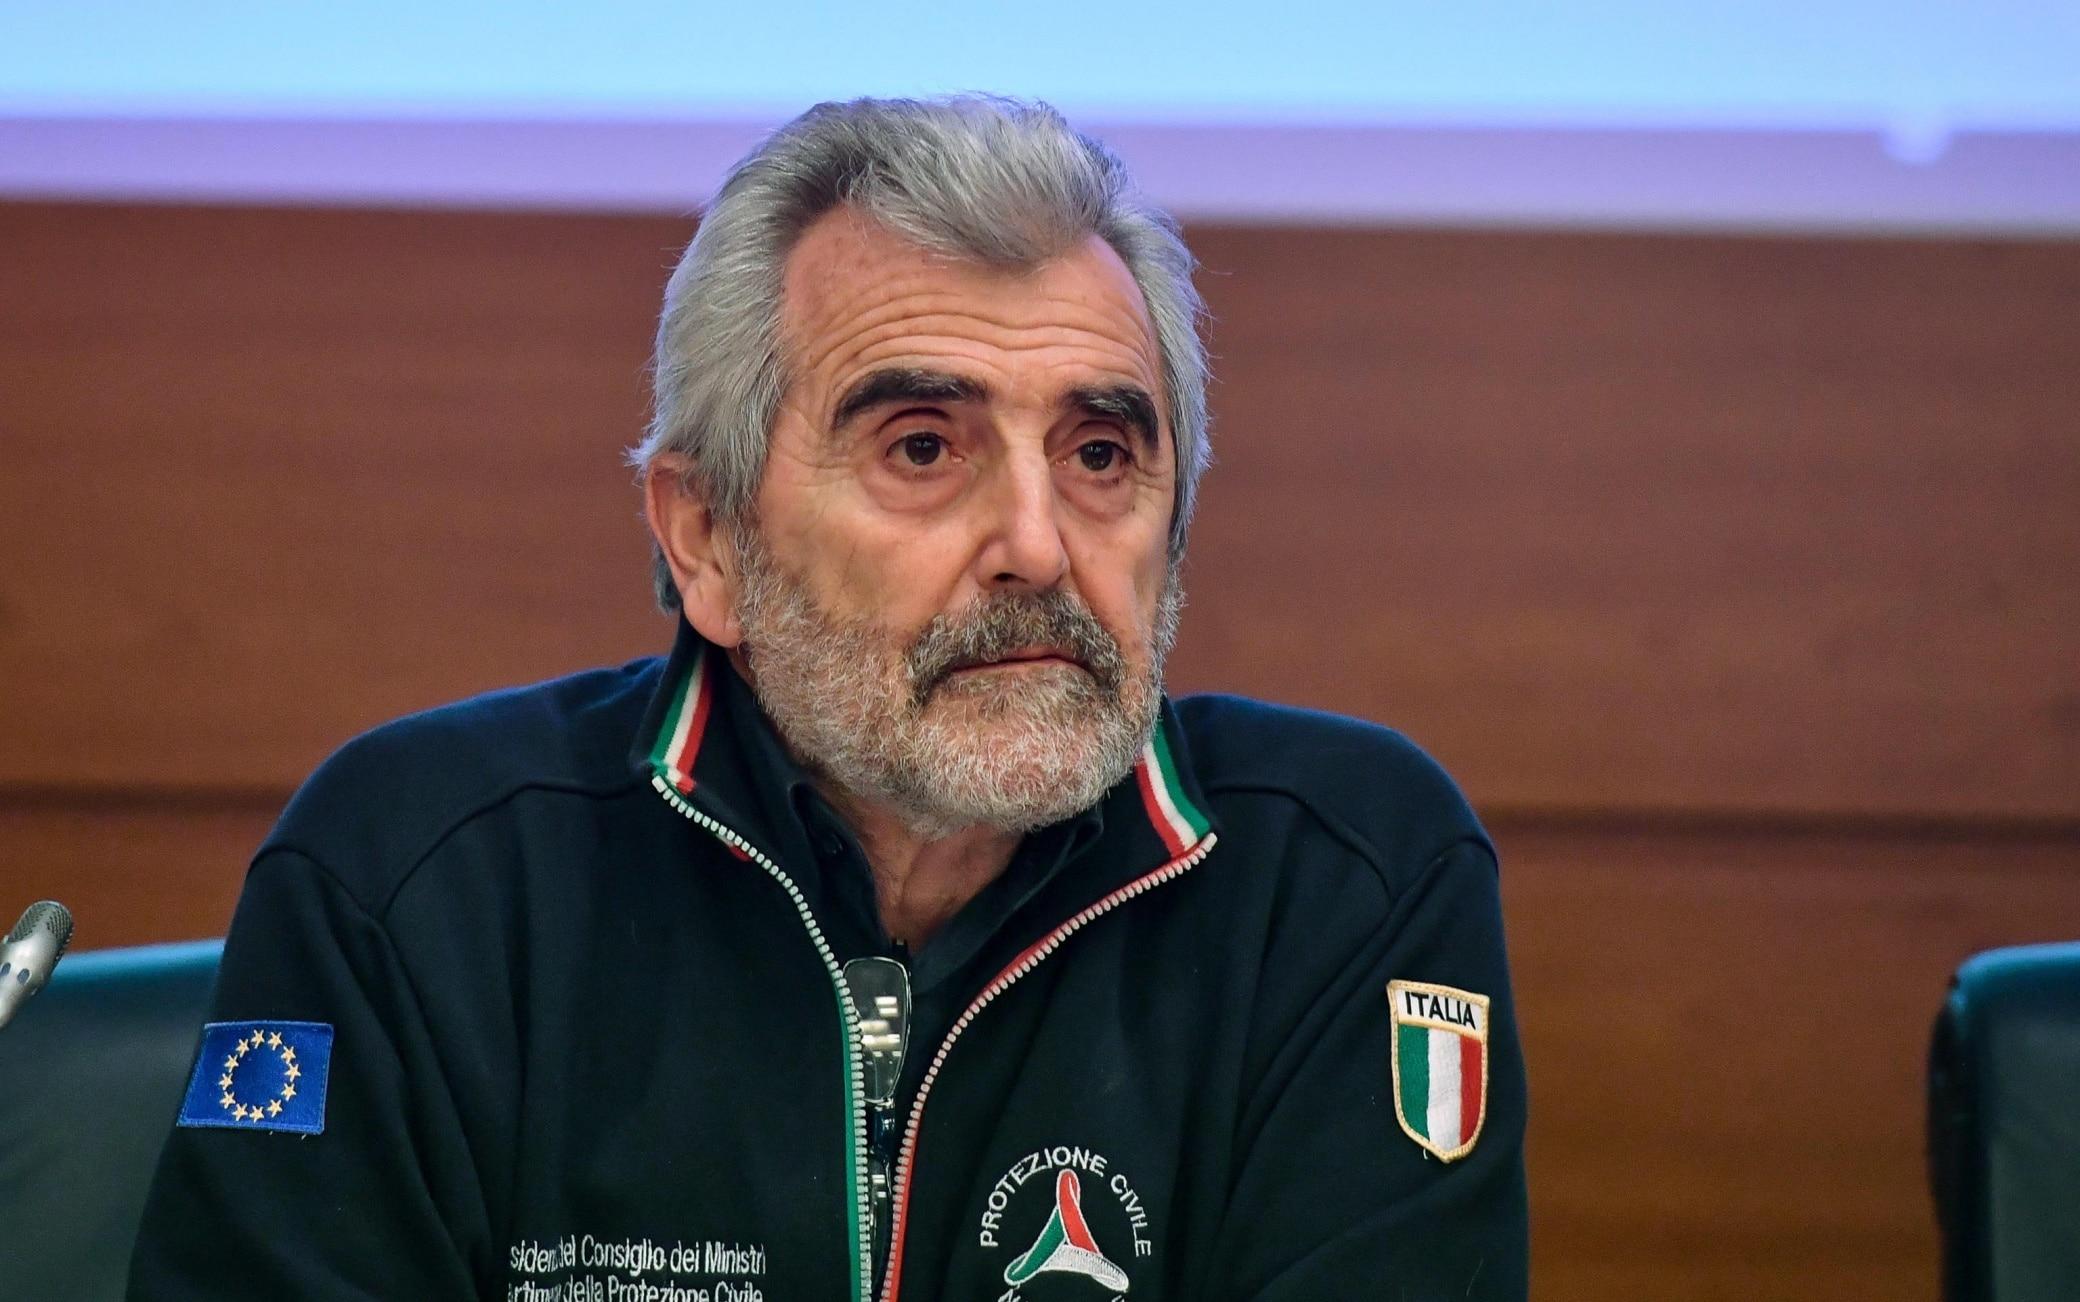 Agostino Miozzo (Cts)